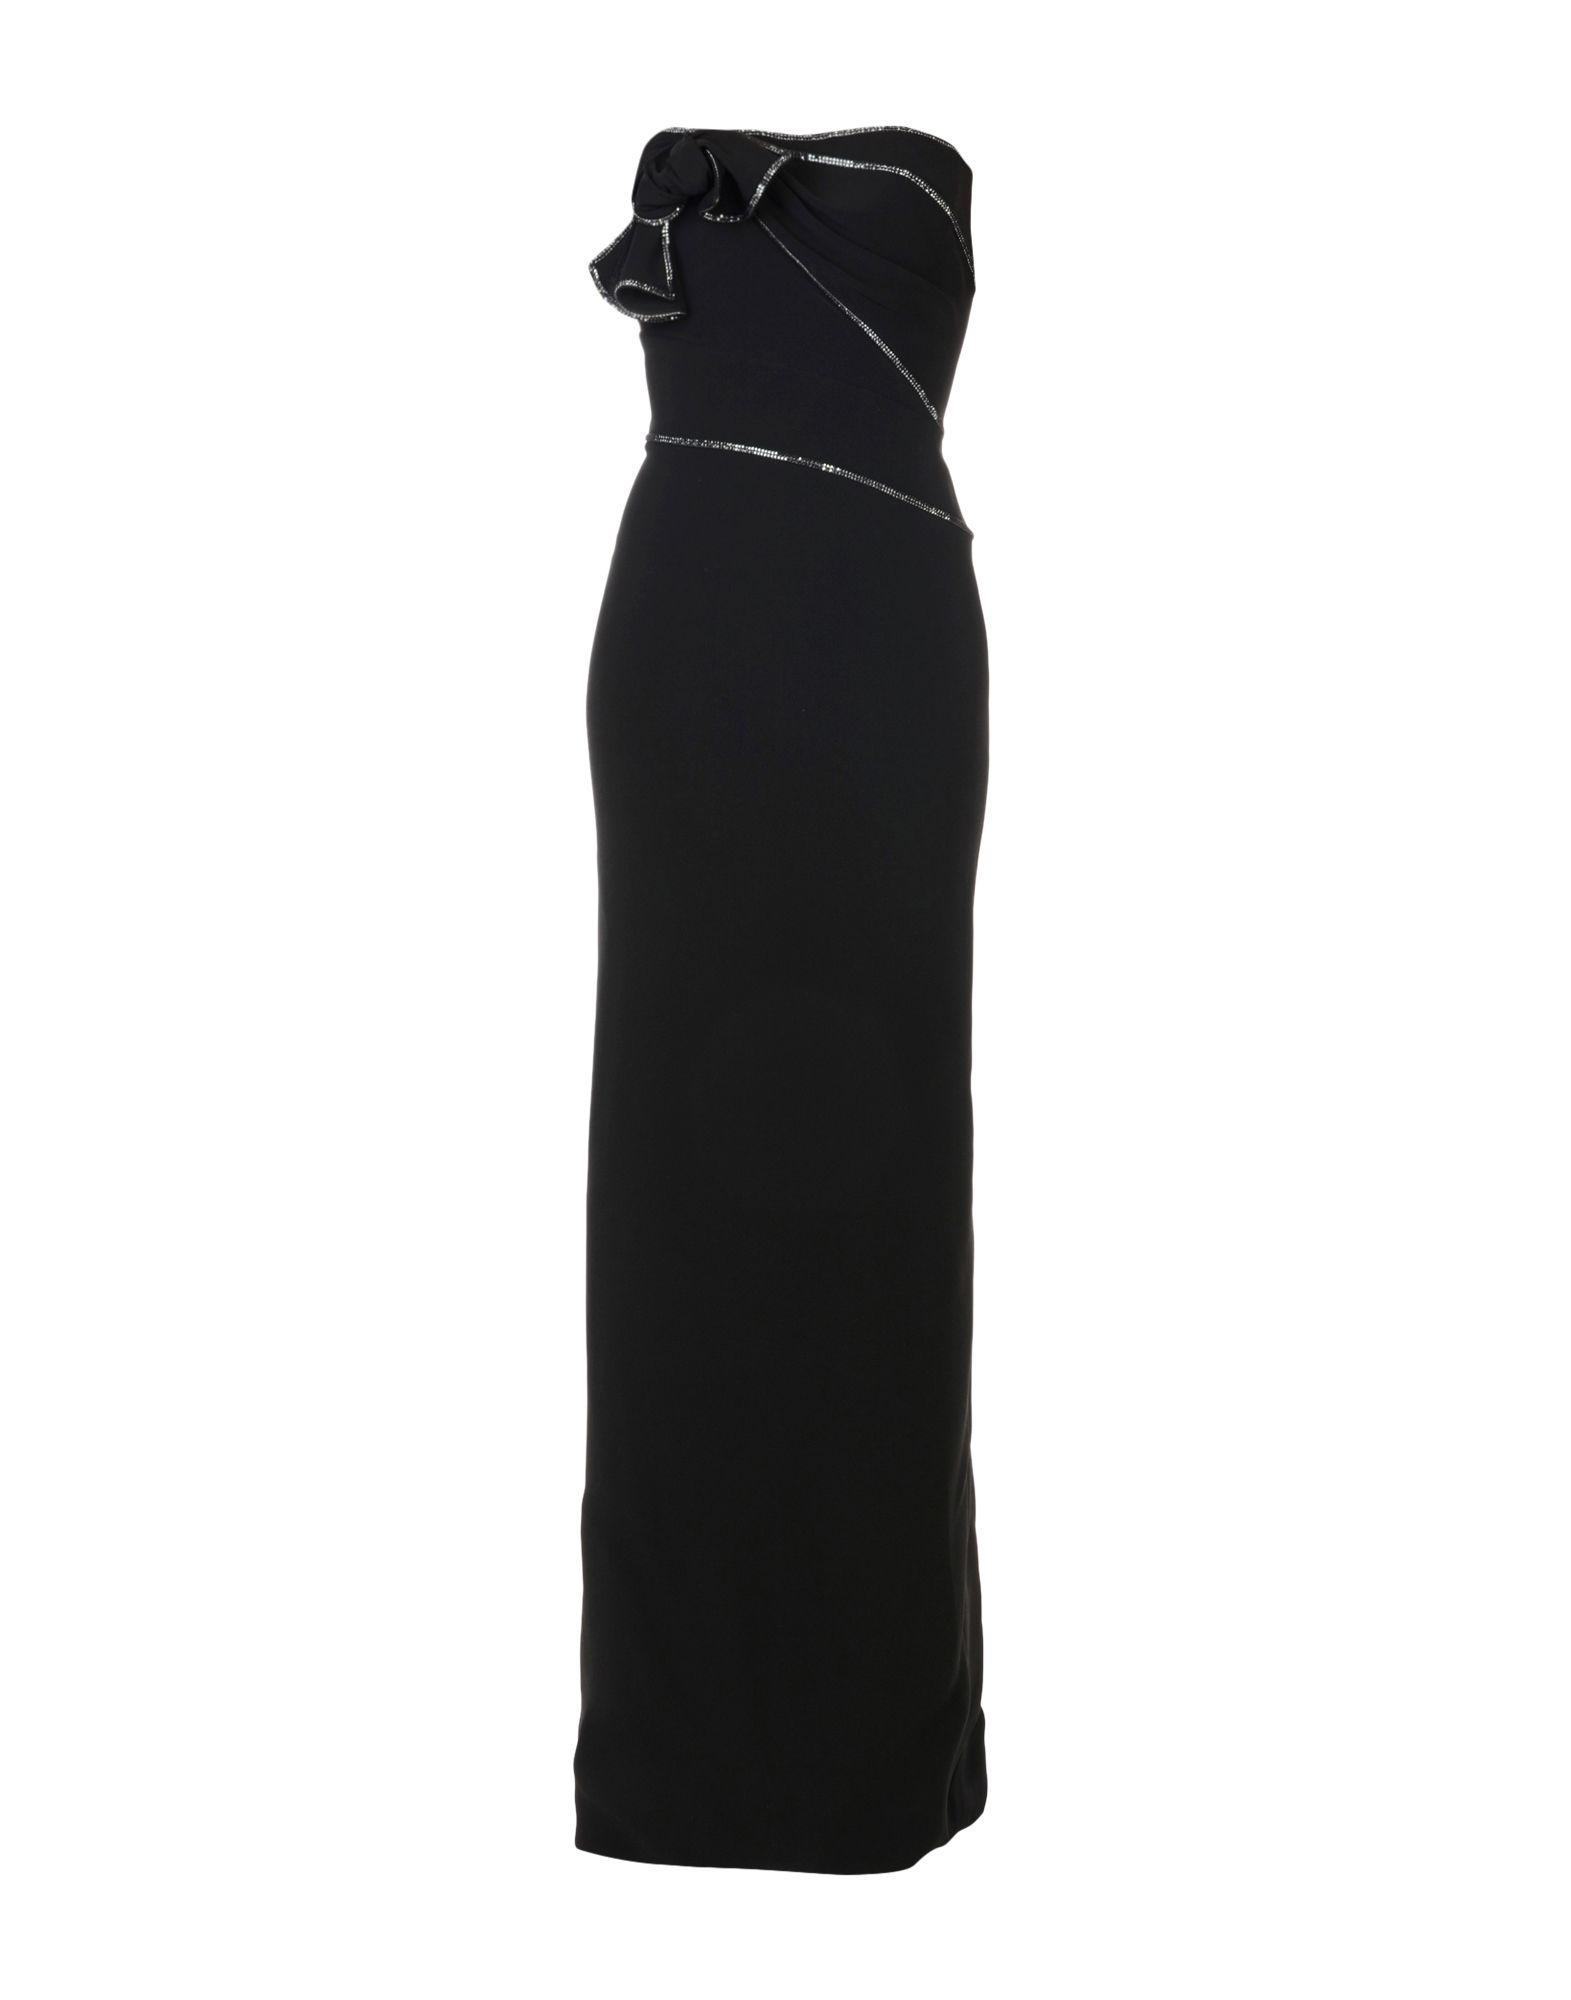 Vestito In Seta Versace Donna - Acquista online su wYaWvR2